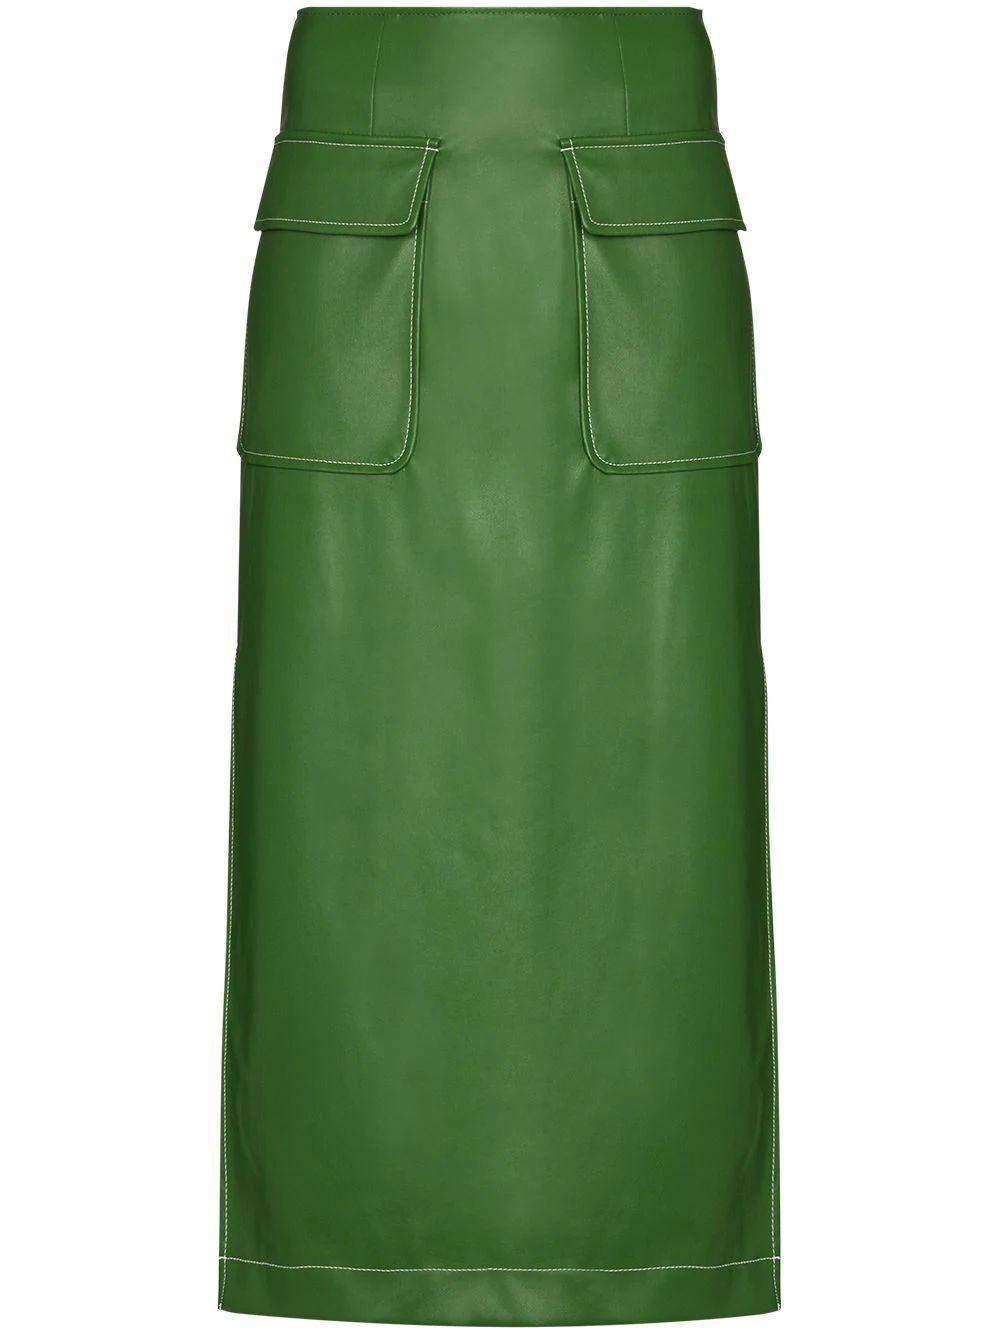 Burn Vegan Leather Midi Skirt